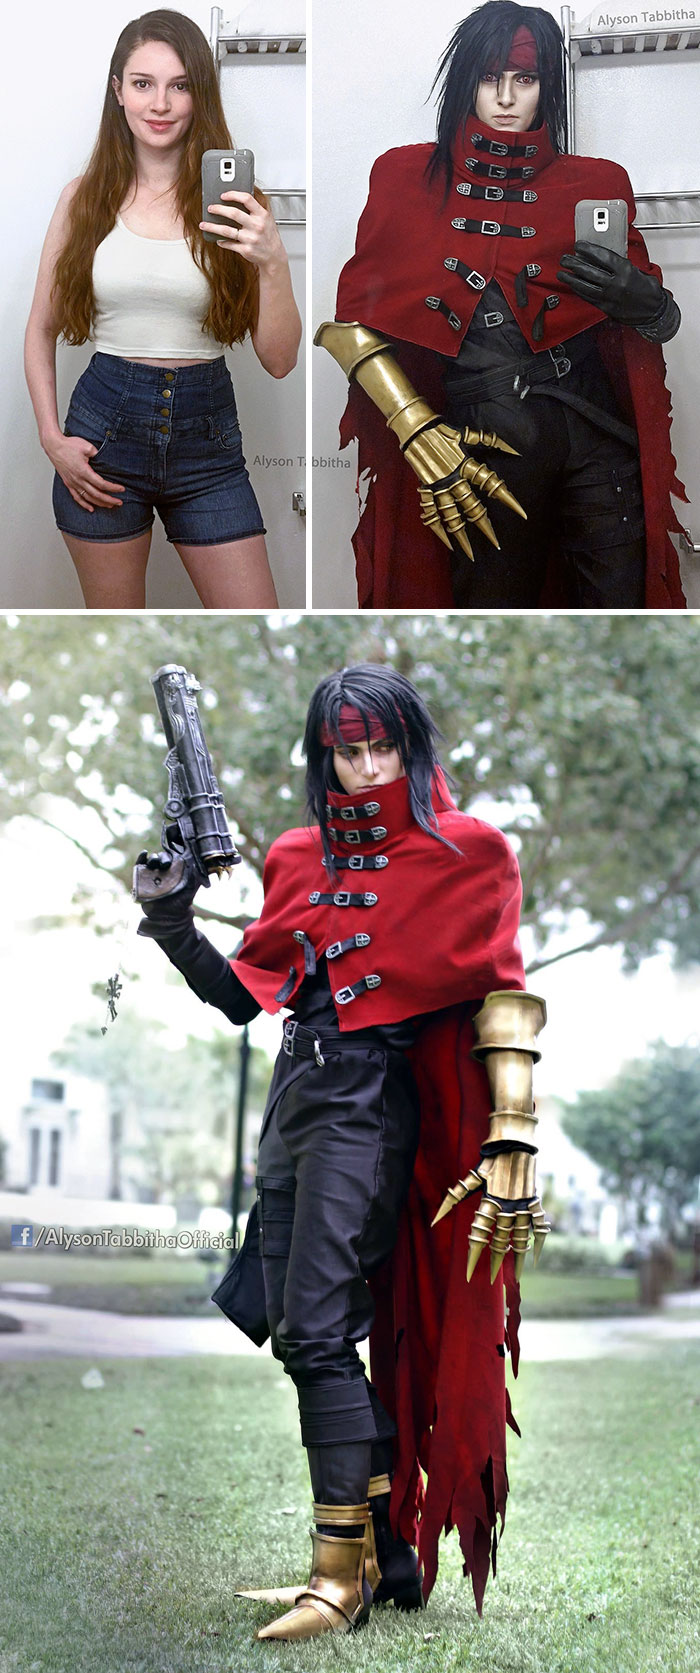 Alyson-Tabbitha-cosplays (8)